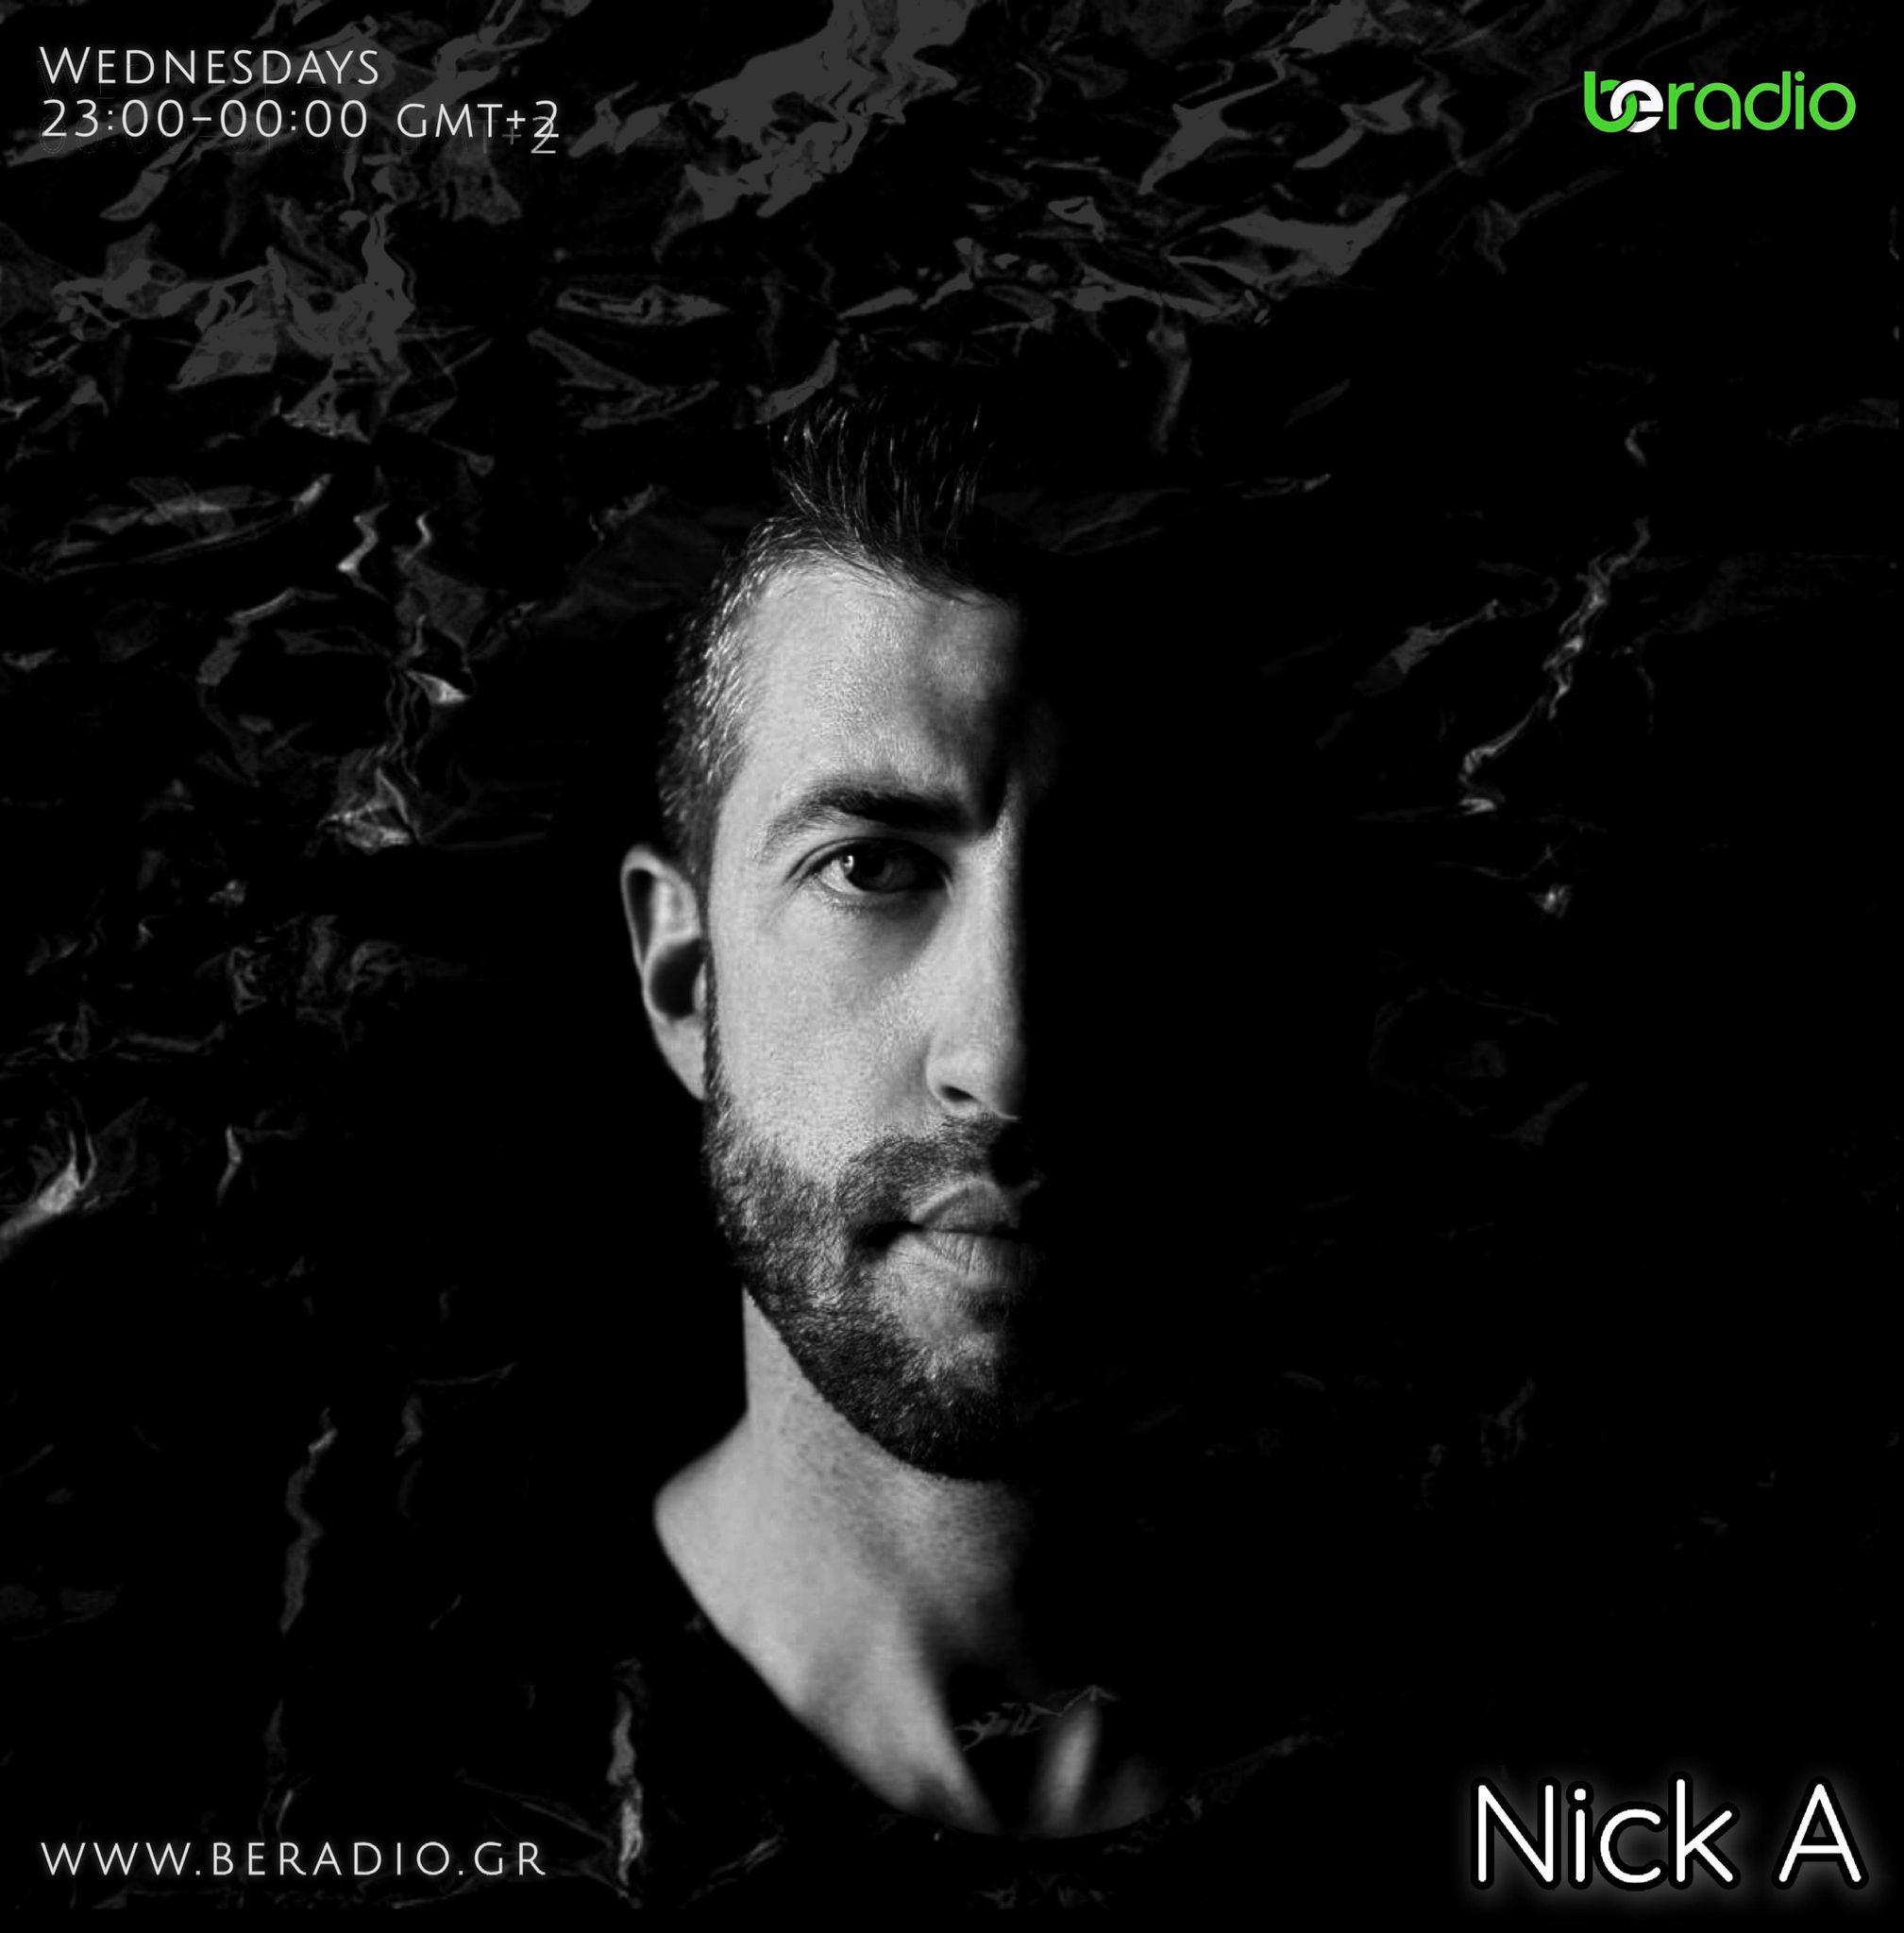 NICK A